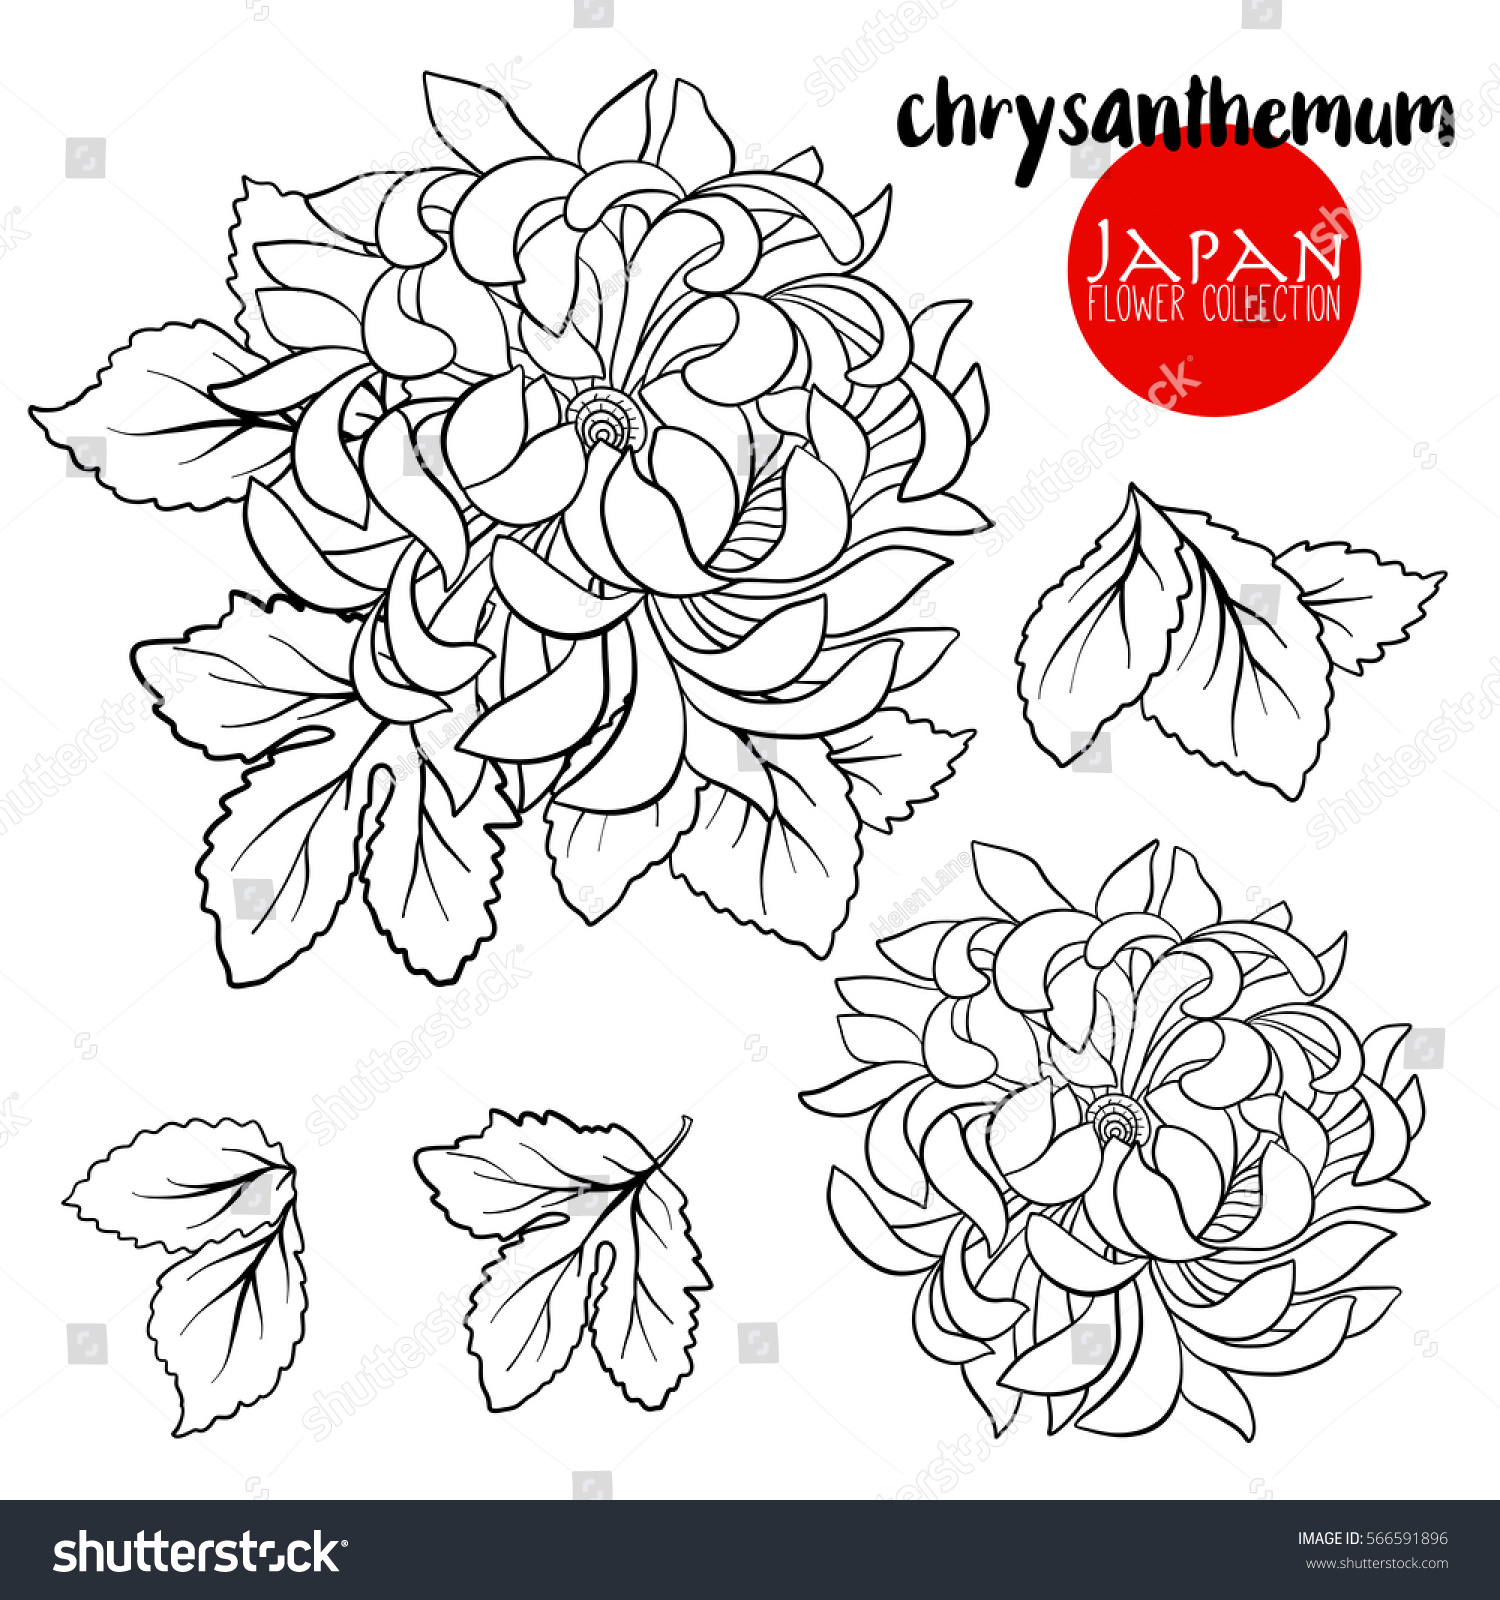 Chrysanthemum Flower Line Drawing : Chrysanthemum flowers stock line vector illustration